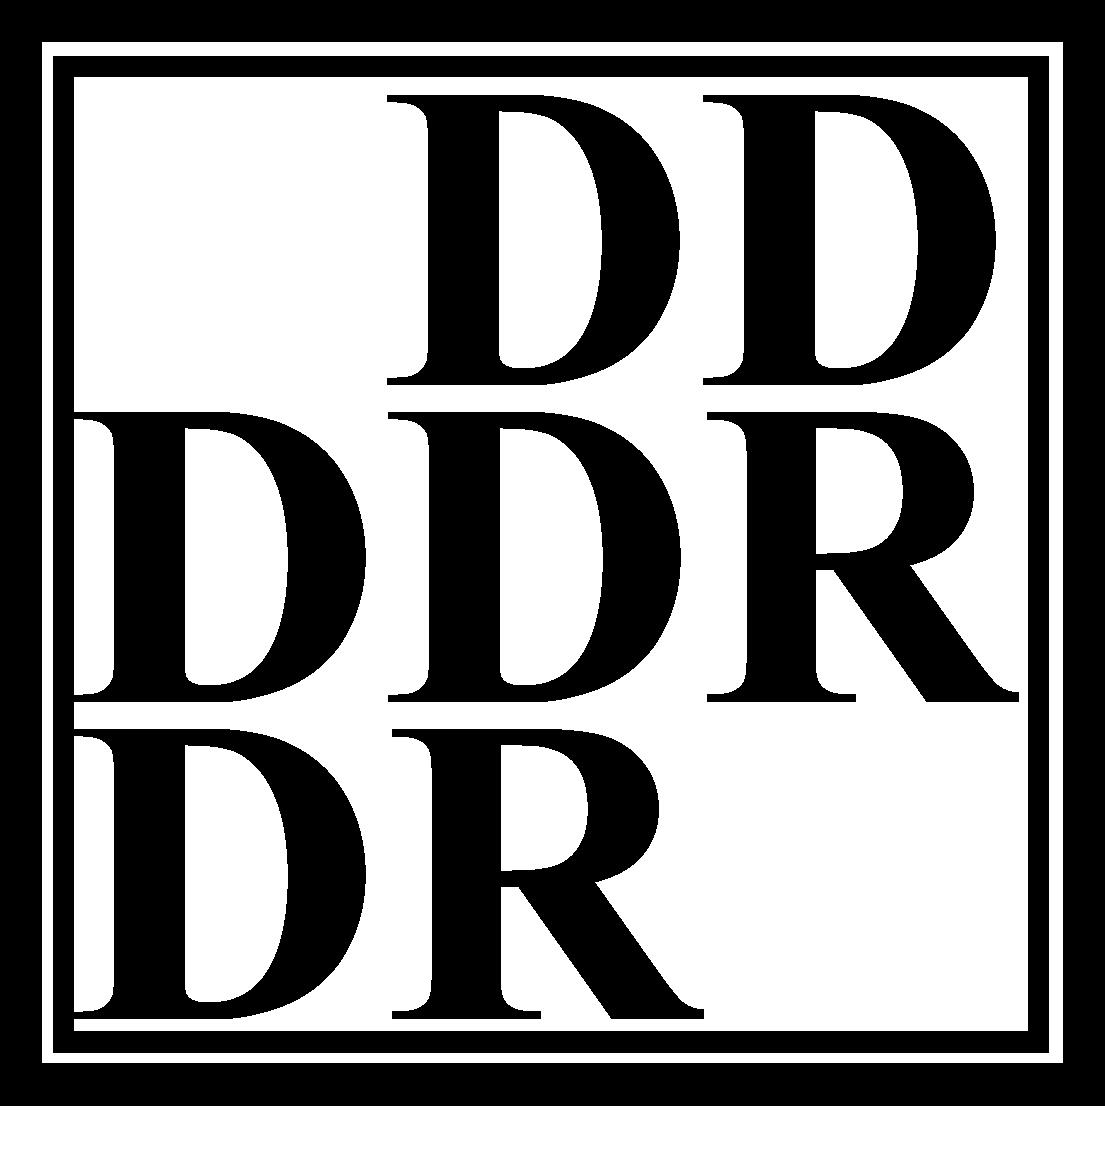 DDR Derek Daniel Reformat Logo Watermark